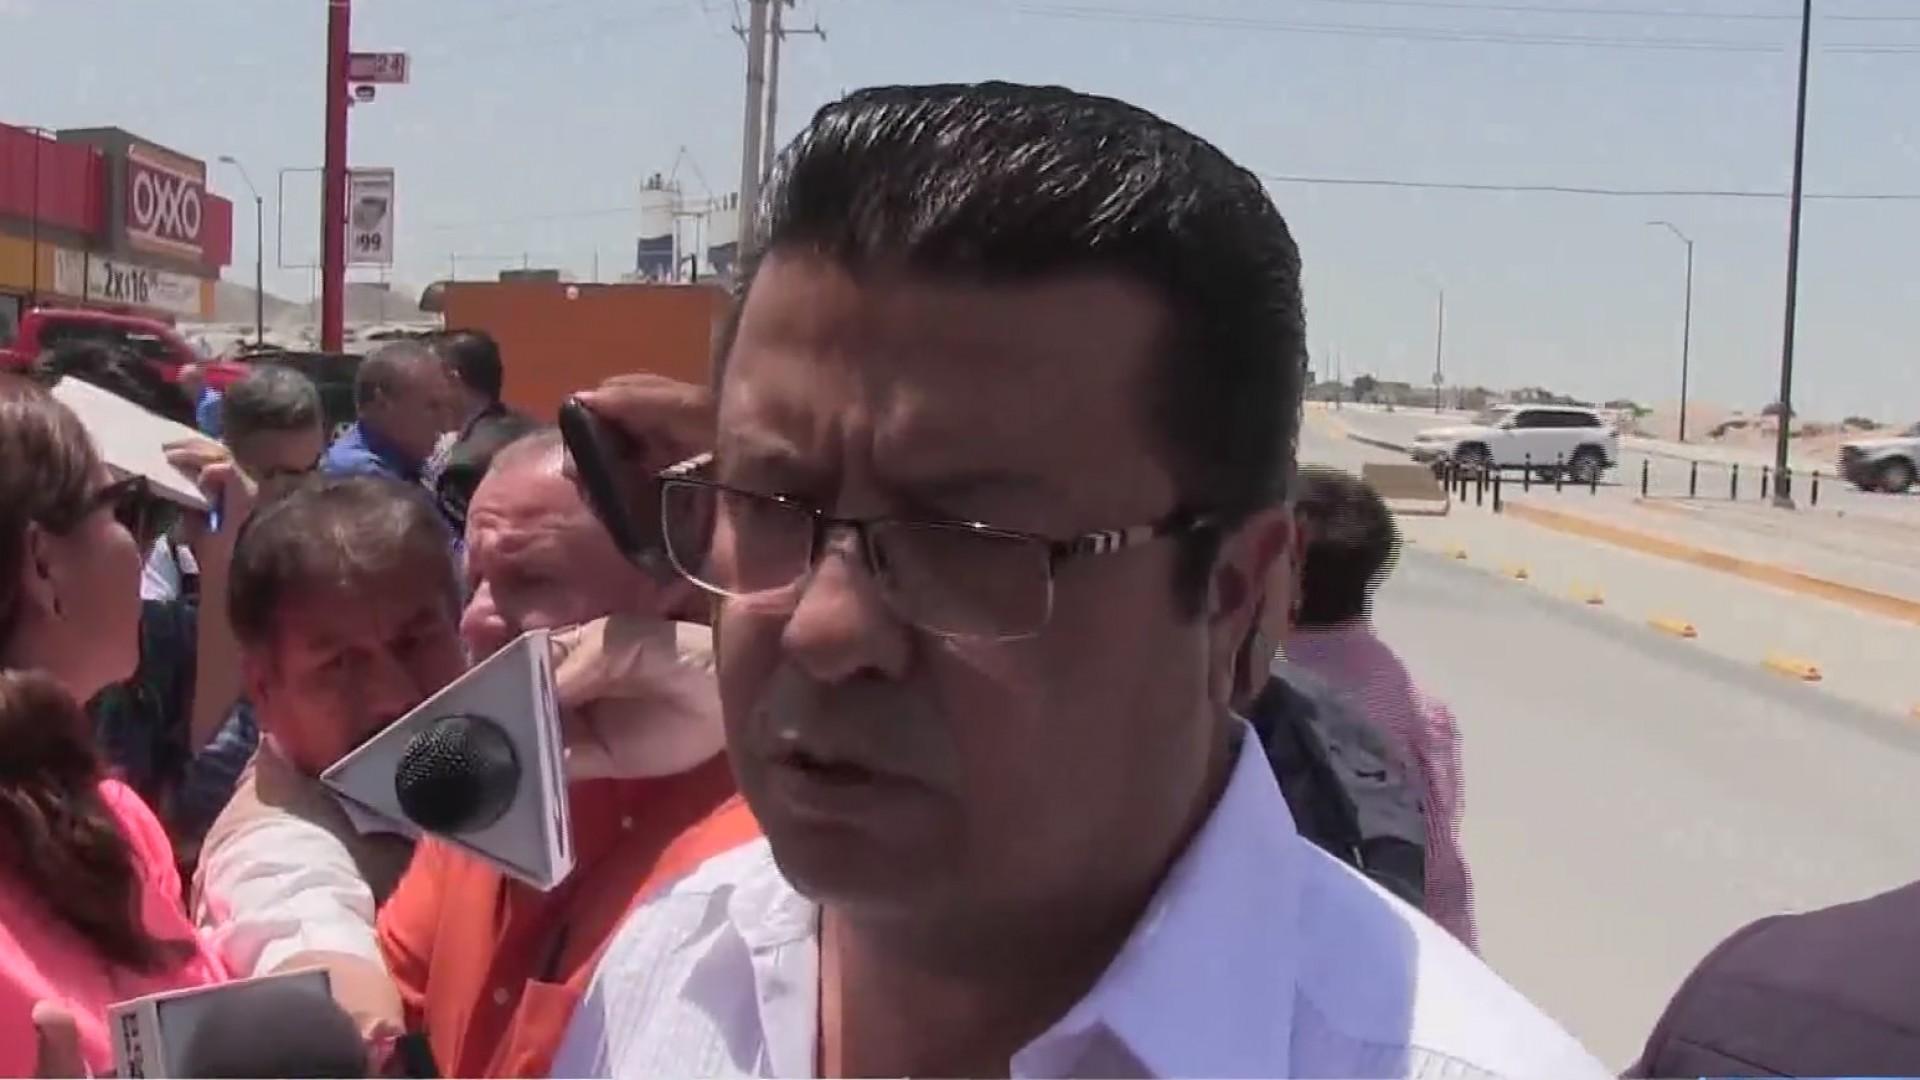 Juarez mayor speaks out against proposed tariffs